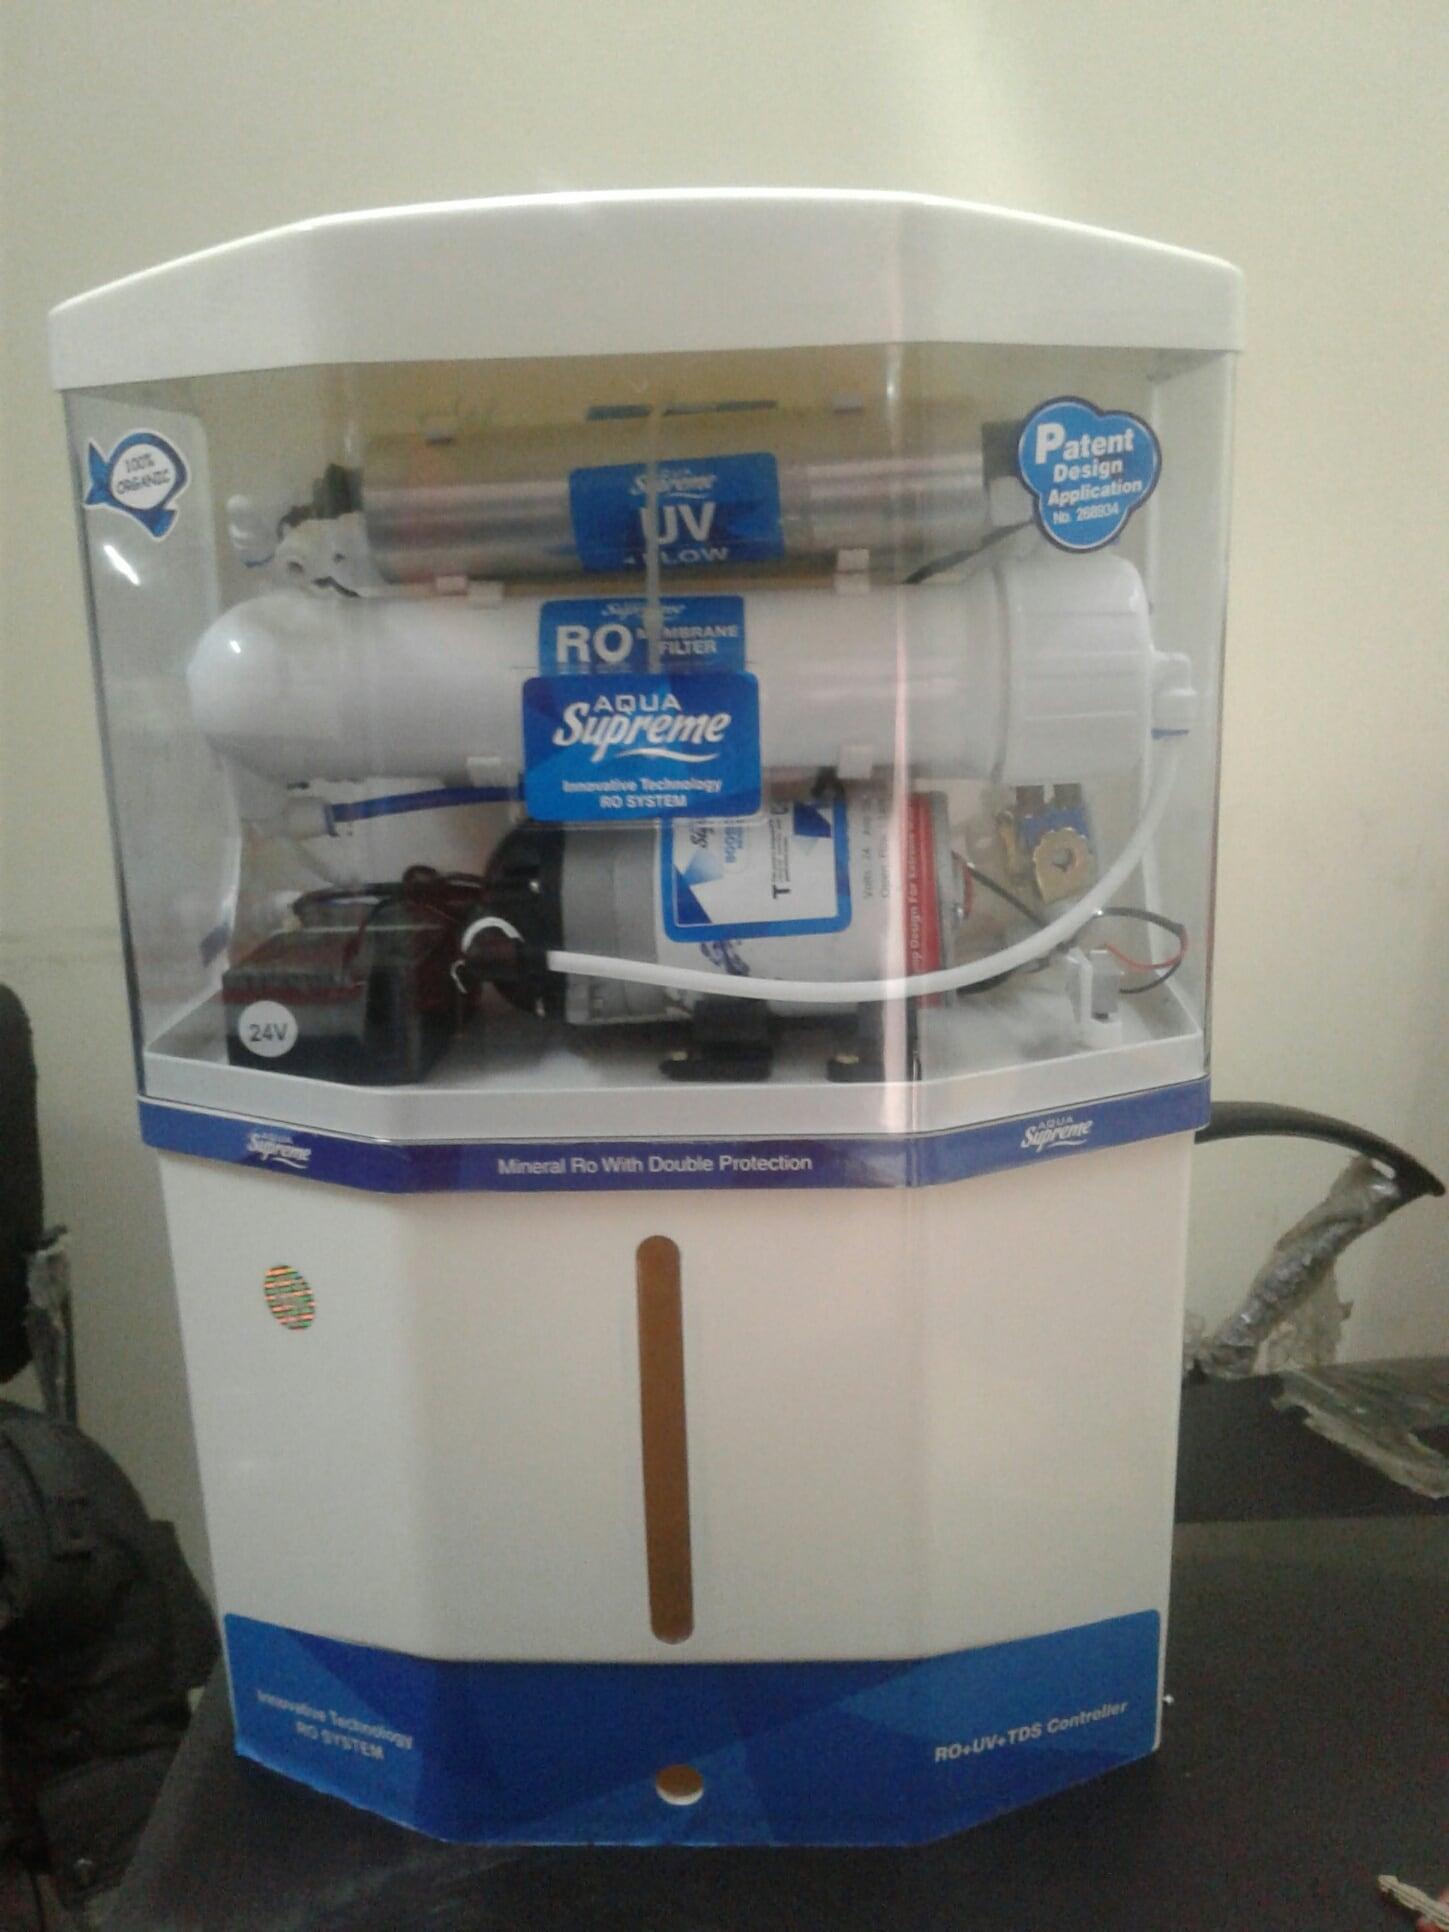 1a57b84099 Aquaguard RO Water Purifier Repair & Services in Nangloi, Delhi ...